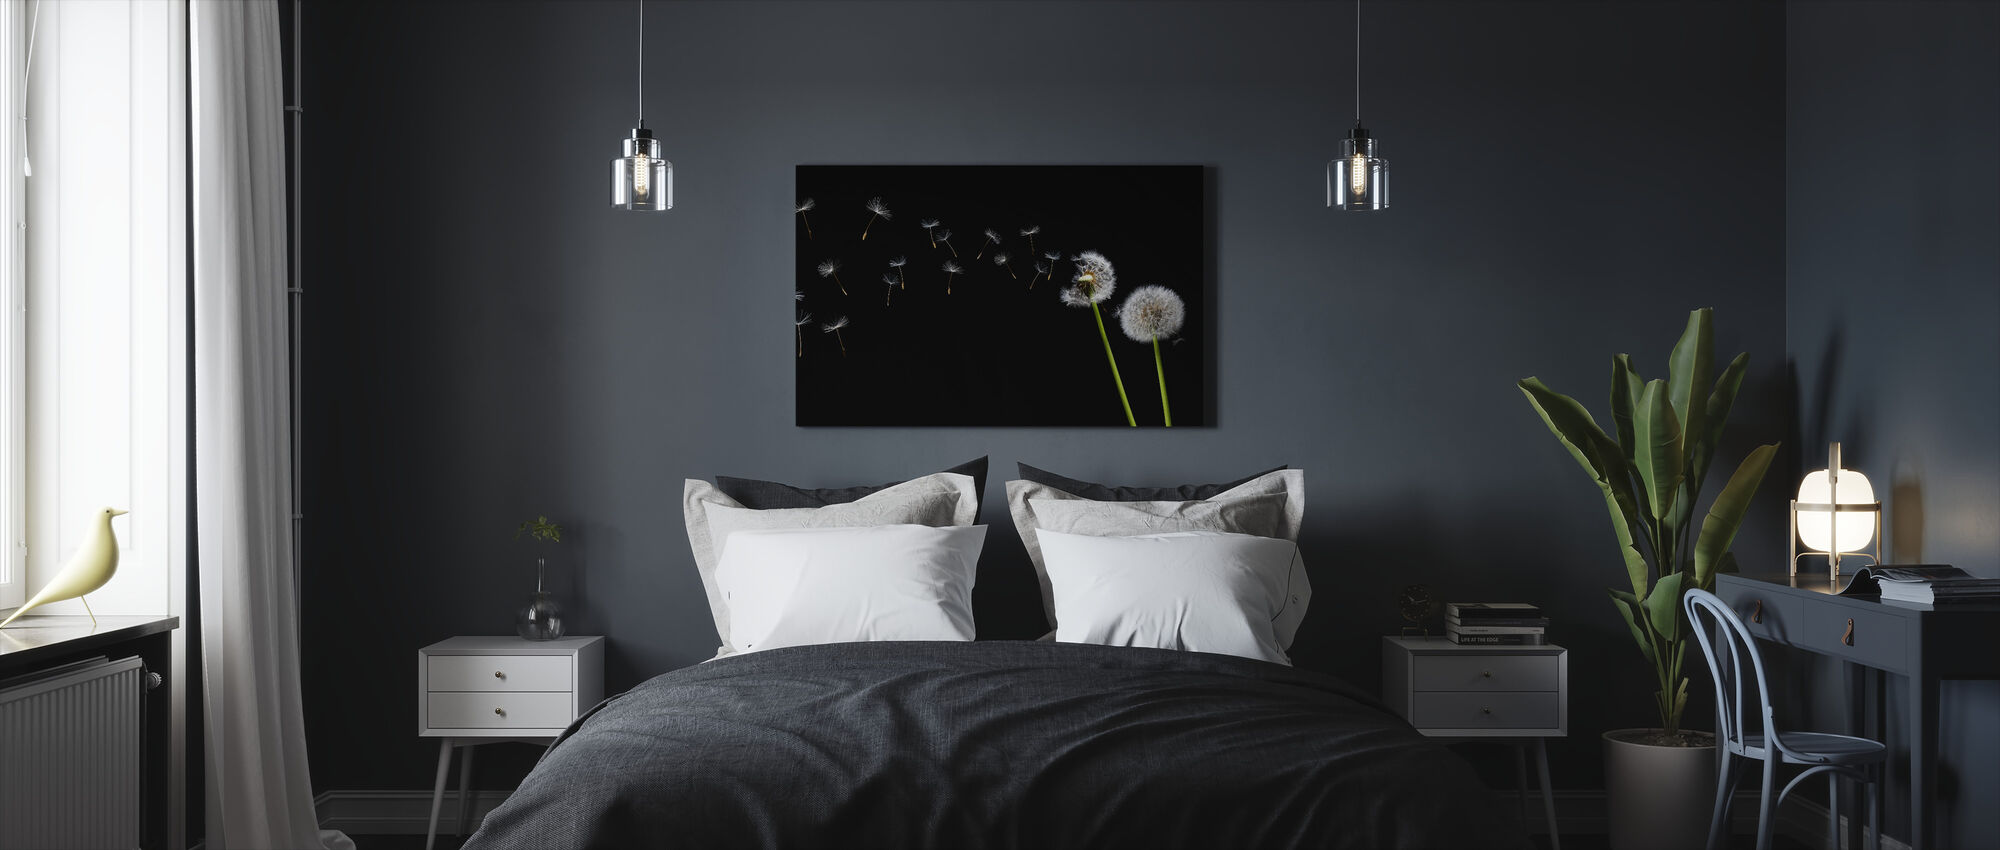 Dandelion Seeds in the Wind - Canvas print - Bedroom